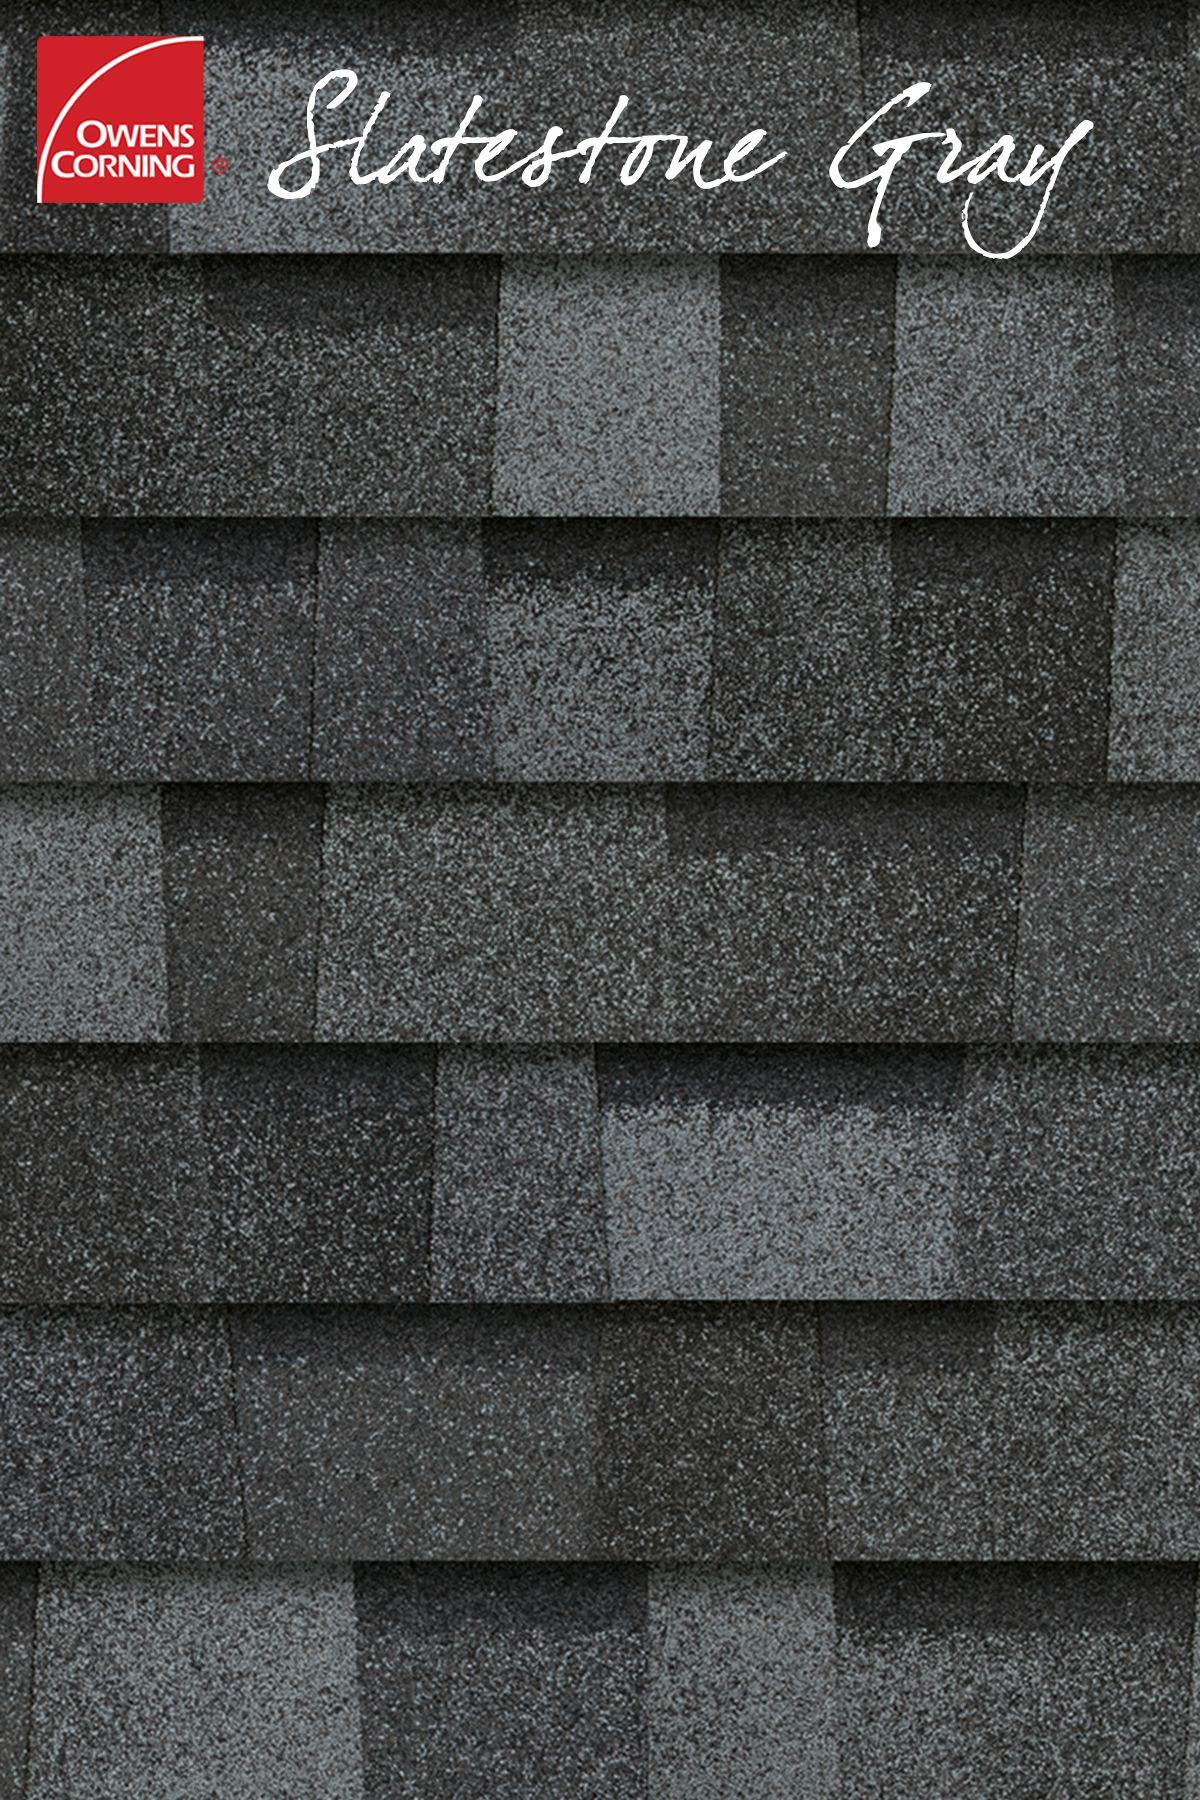 Slatestone Gray Trudefinition Duration Shingles Roof Shingle